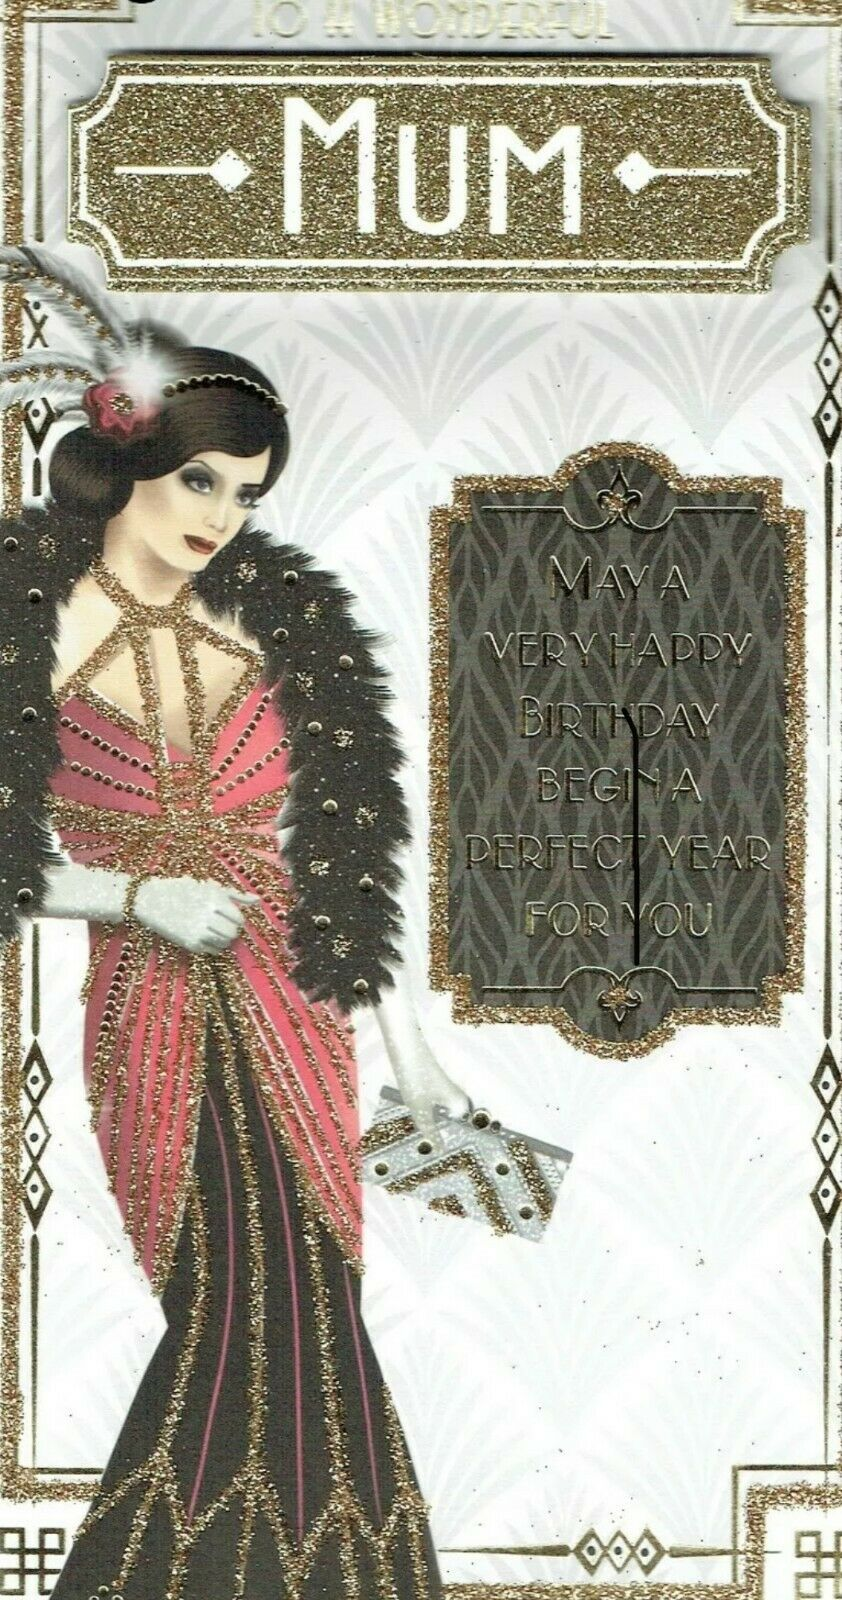 Art Deco Style Birthday Card - To A Wonderful Mum